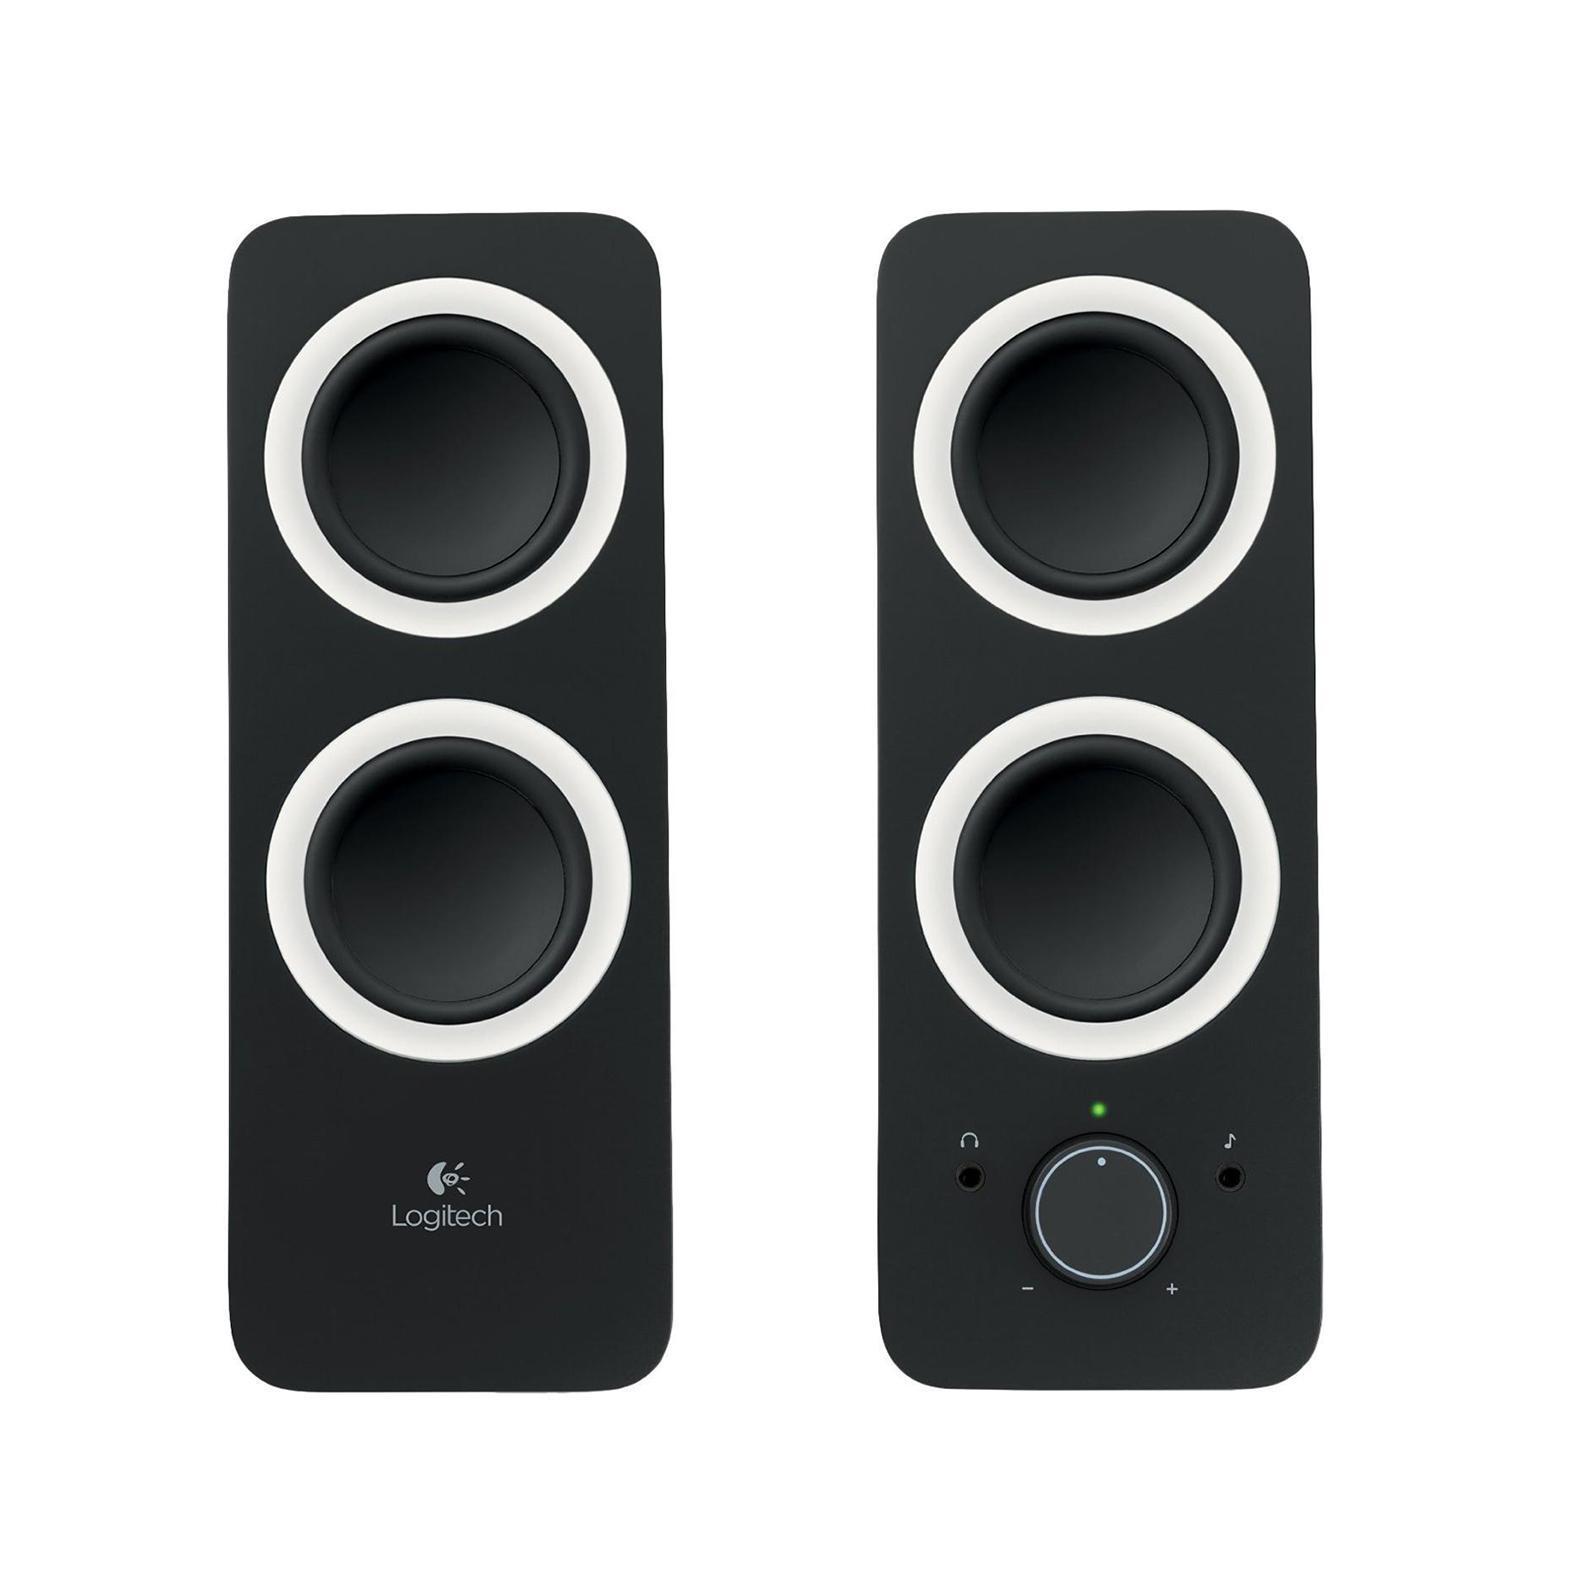 лучшая цена Компьютерная акустика Logitech Z200, Midnight Black (980-000810)